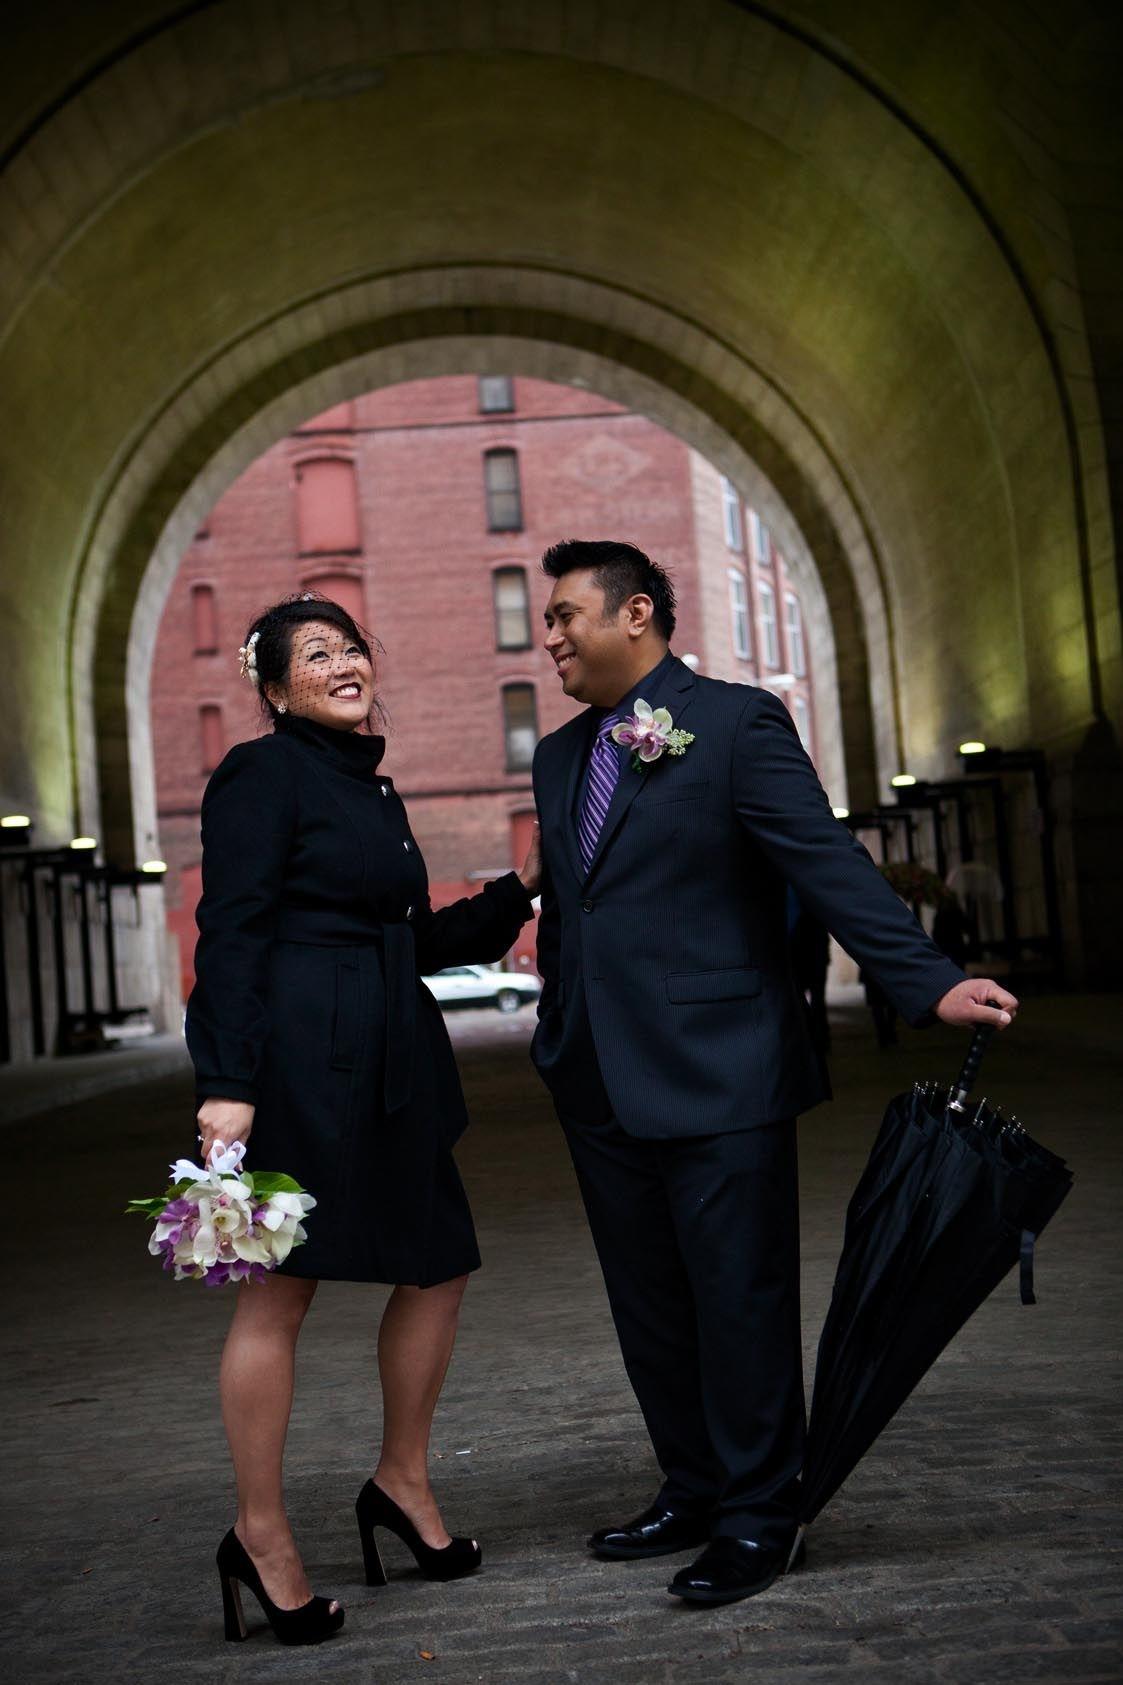 wedding at dumbo lofts